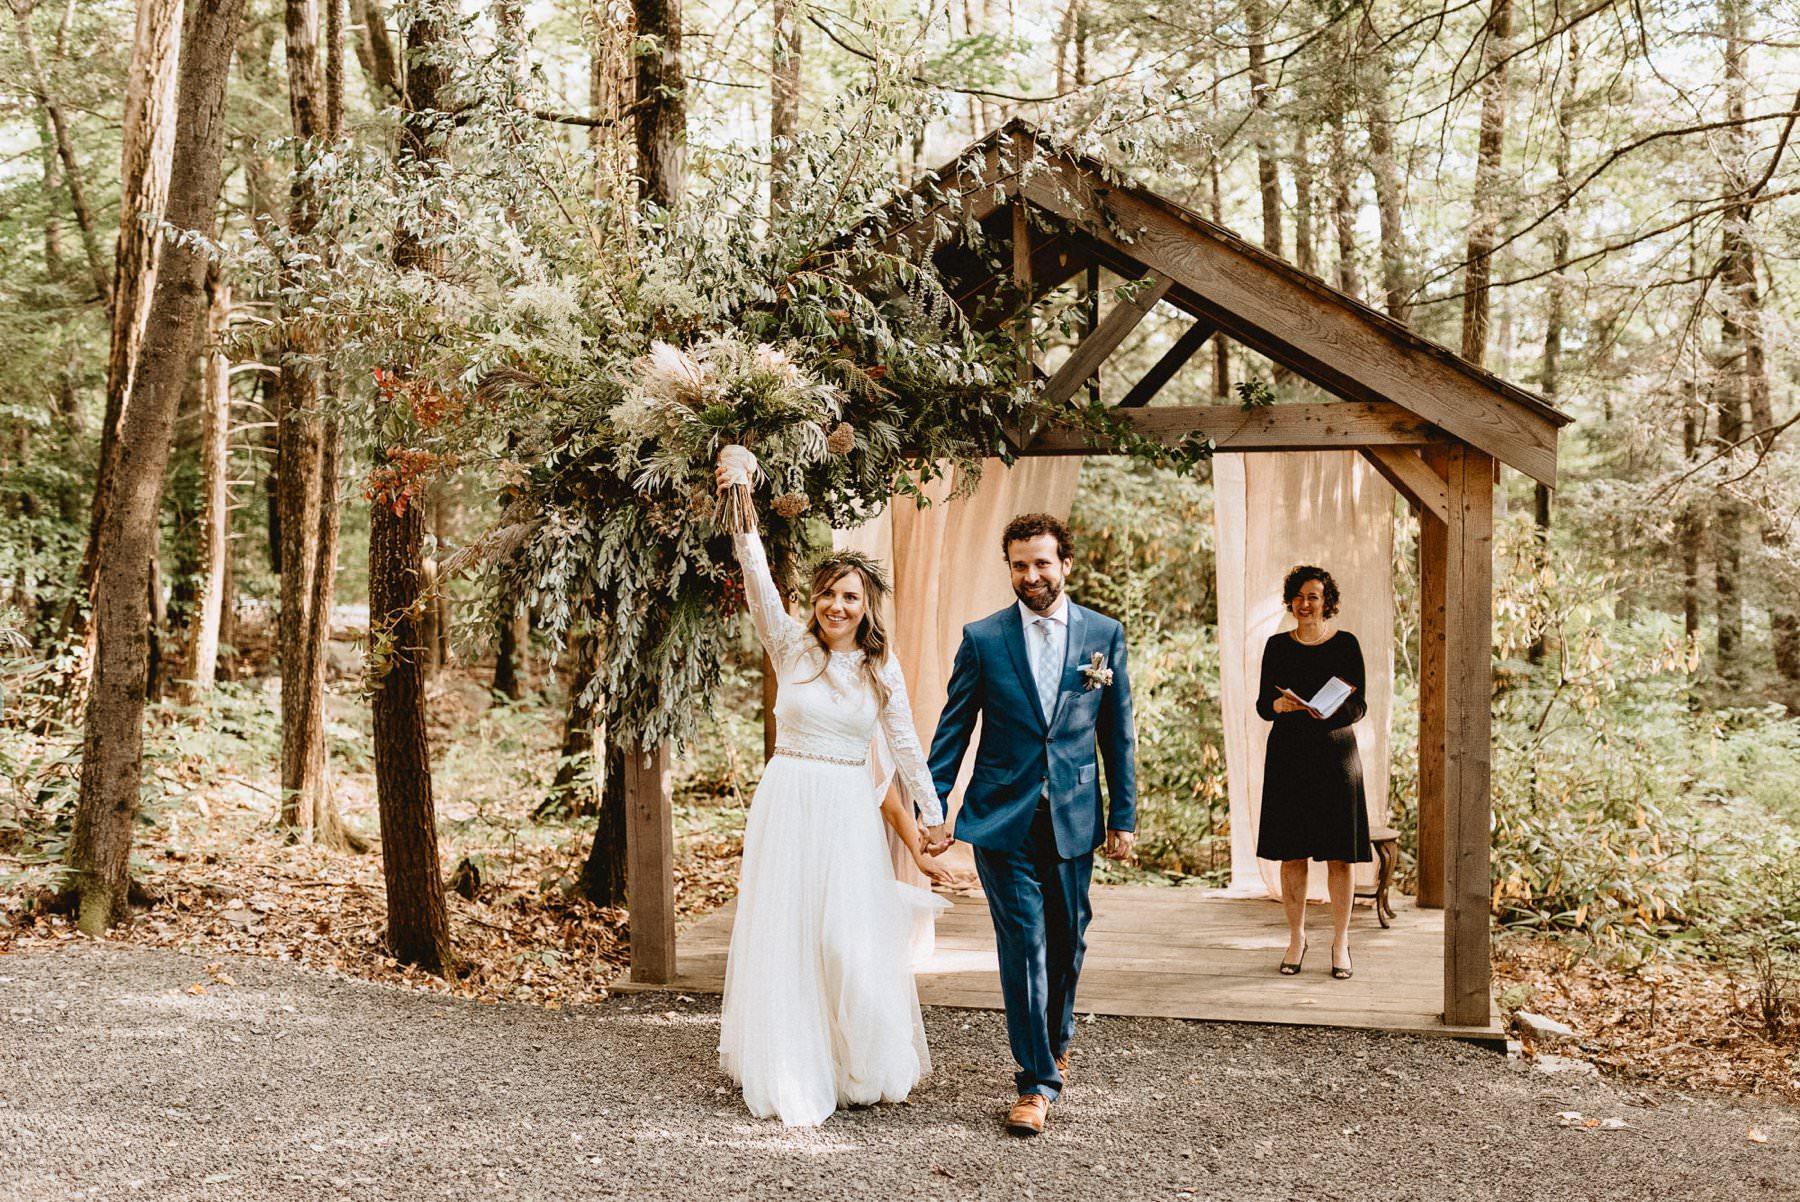 046-Tall-timber-barn-wedding-61.jpg